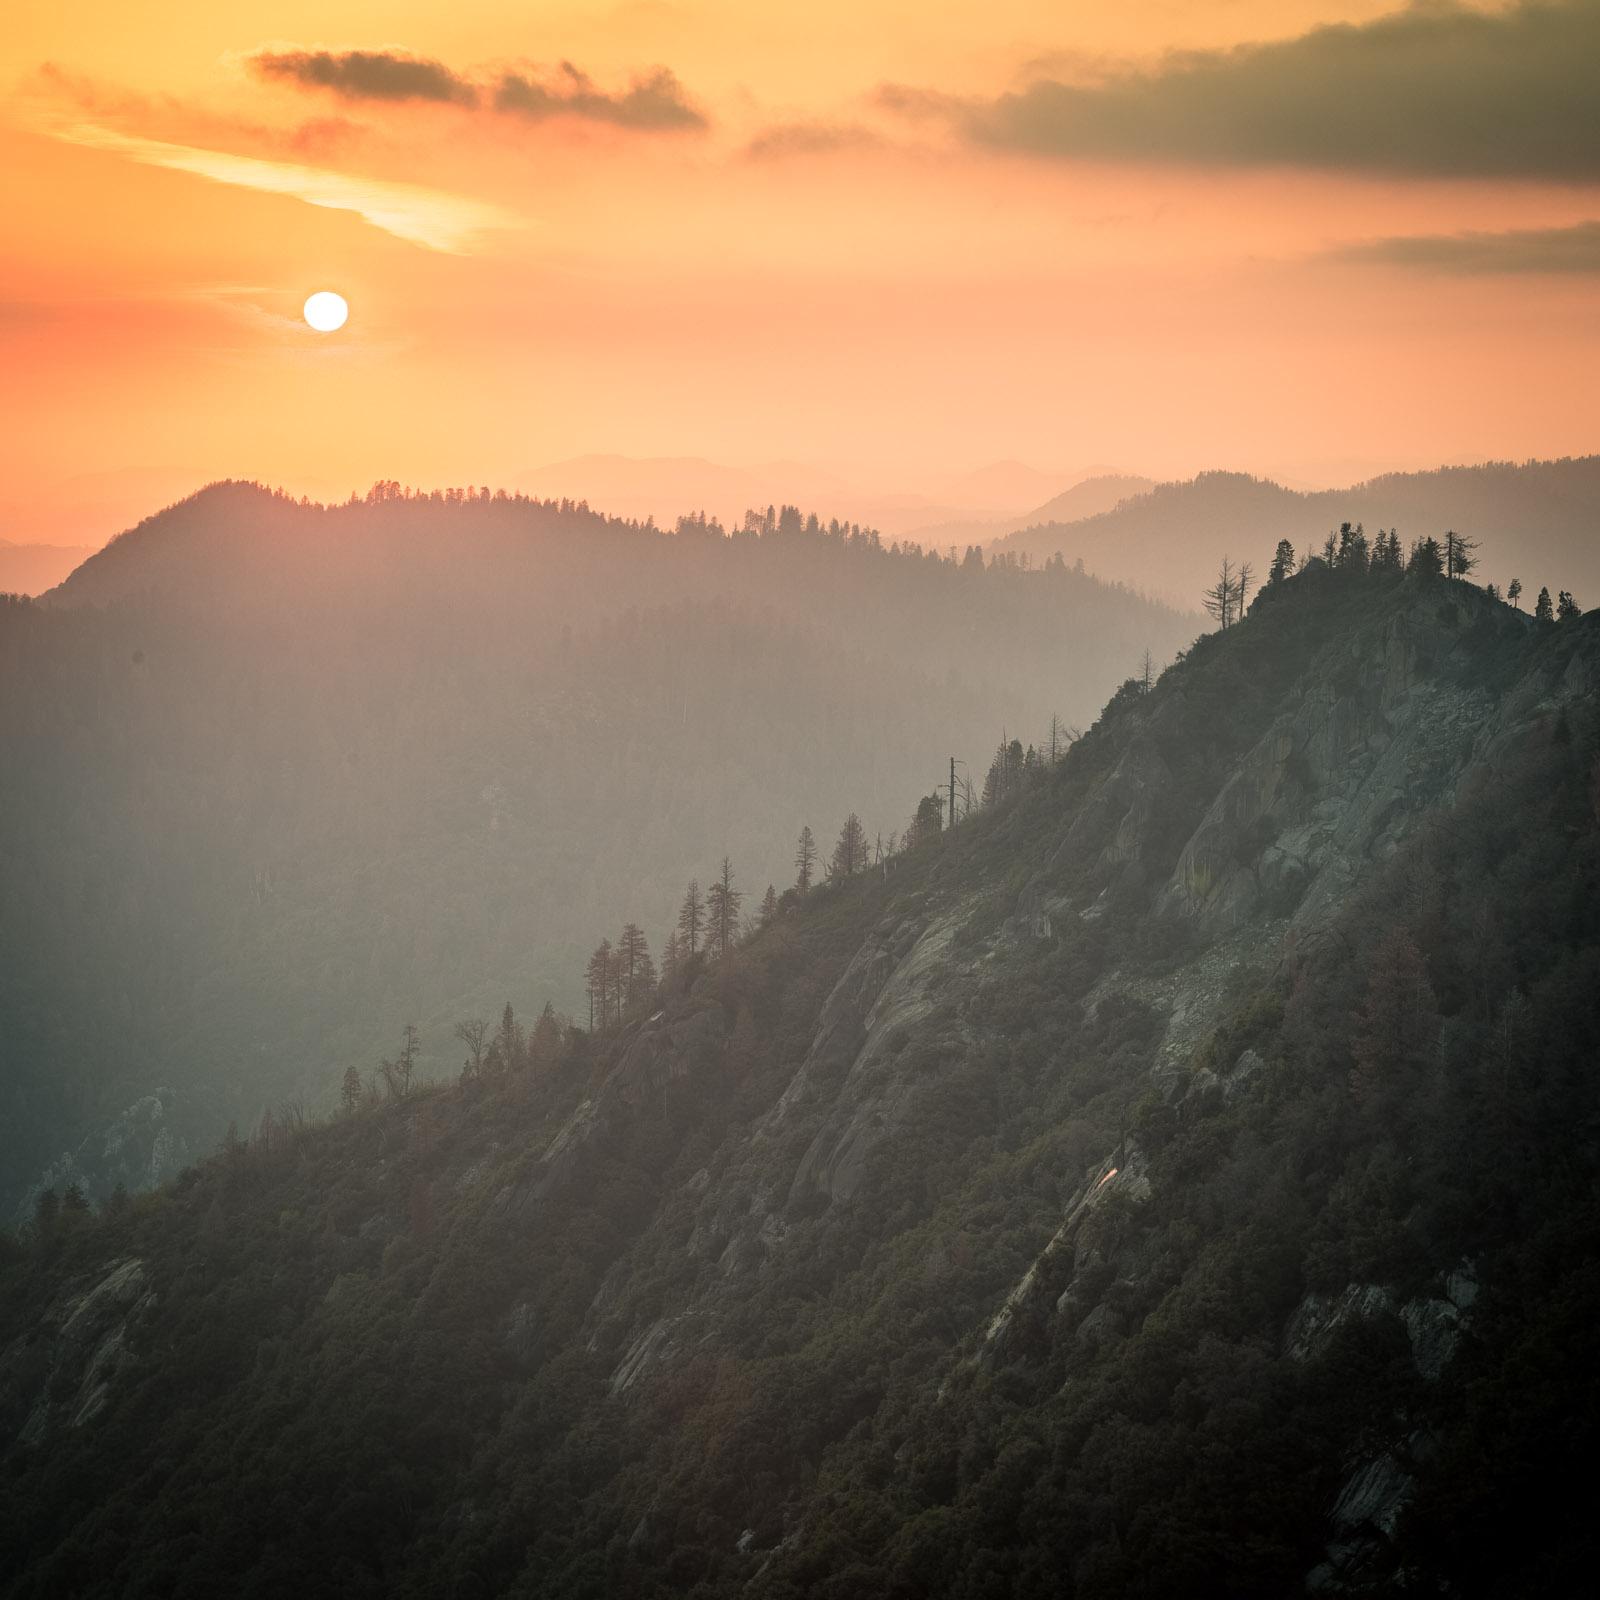 Moro Rock – Sonnenuntergang auf 2050 Metern